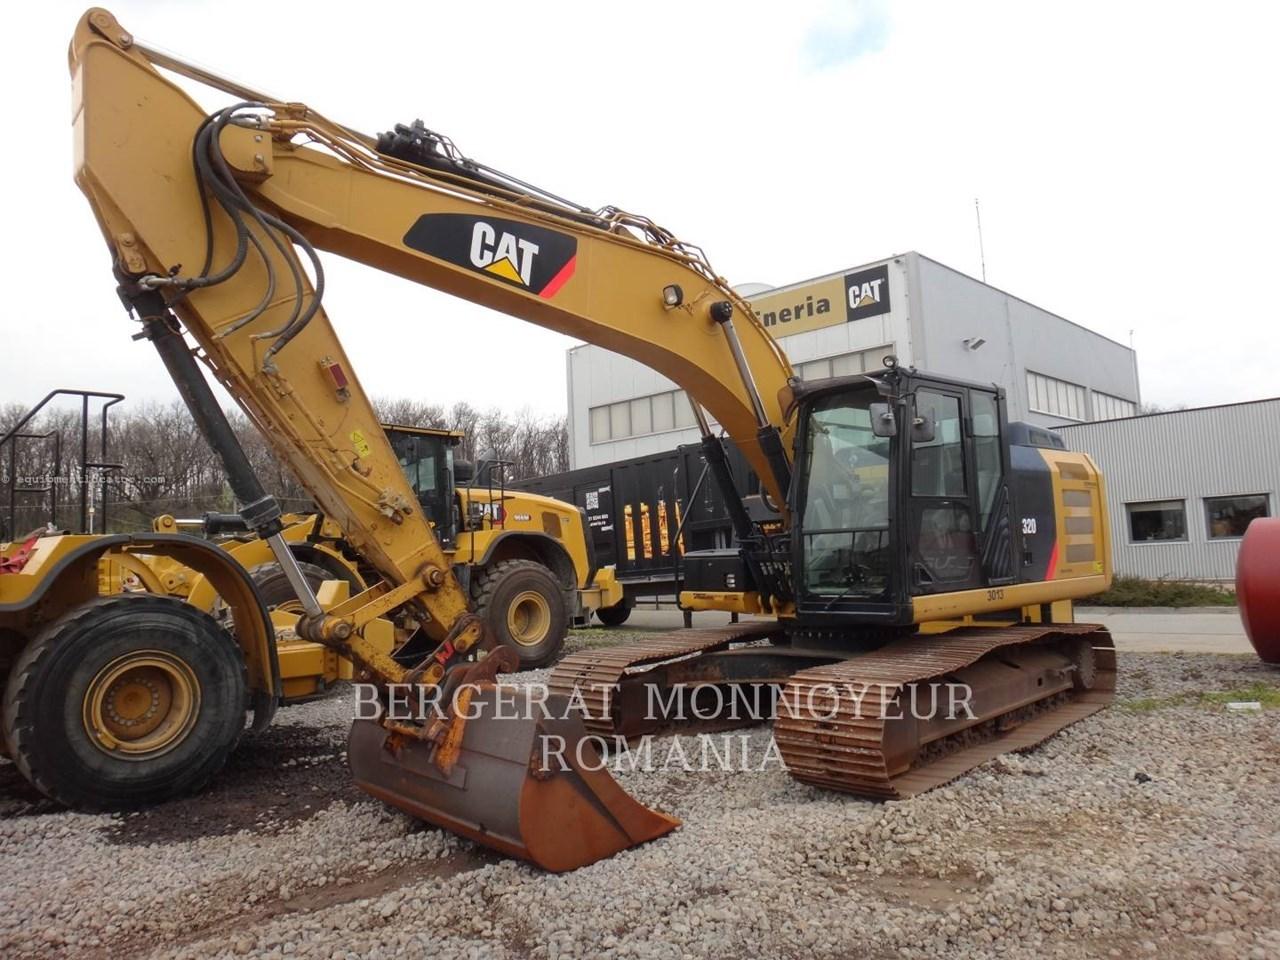 2012 Caterpillar 320EL Image 1